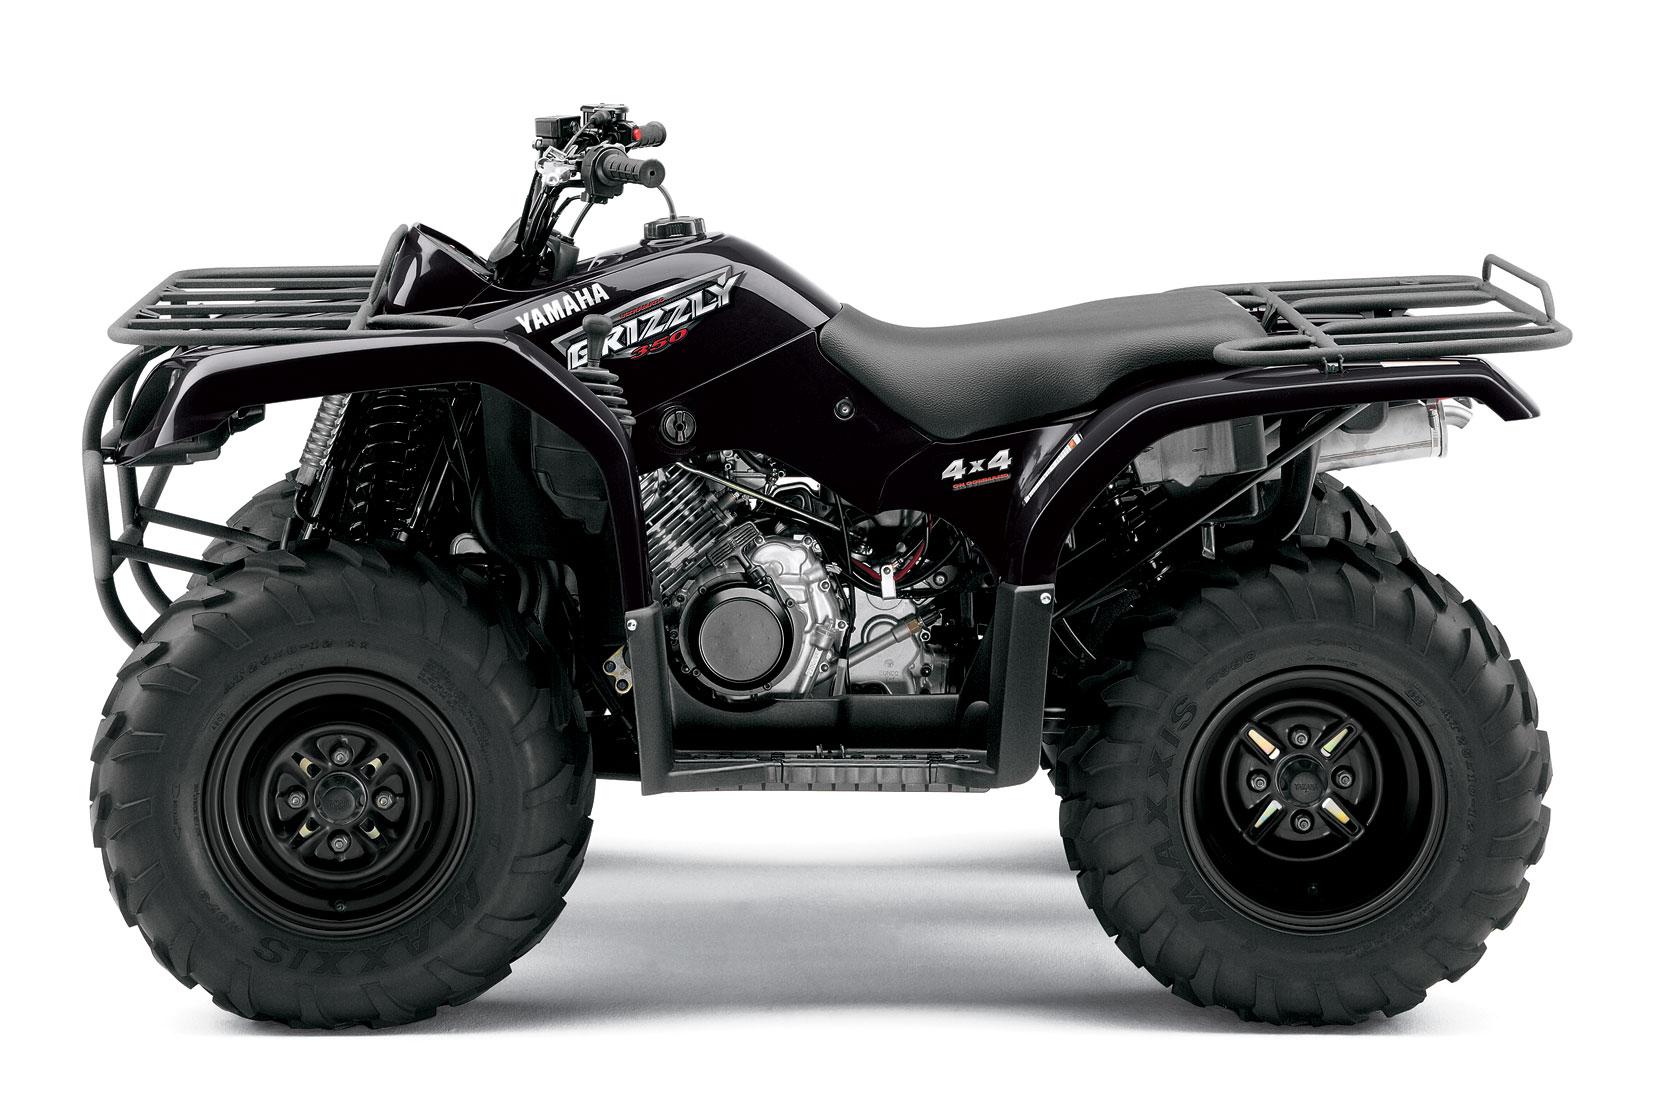 Yamaha Bruin 350 >> YAMAHA Grizzly 350 4x4 specs - 2008, 2009 - autoevolution